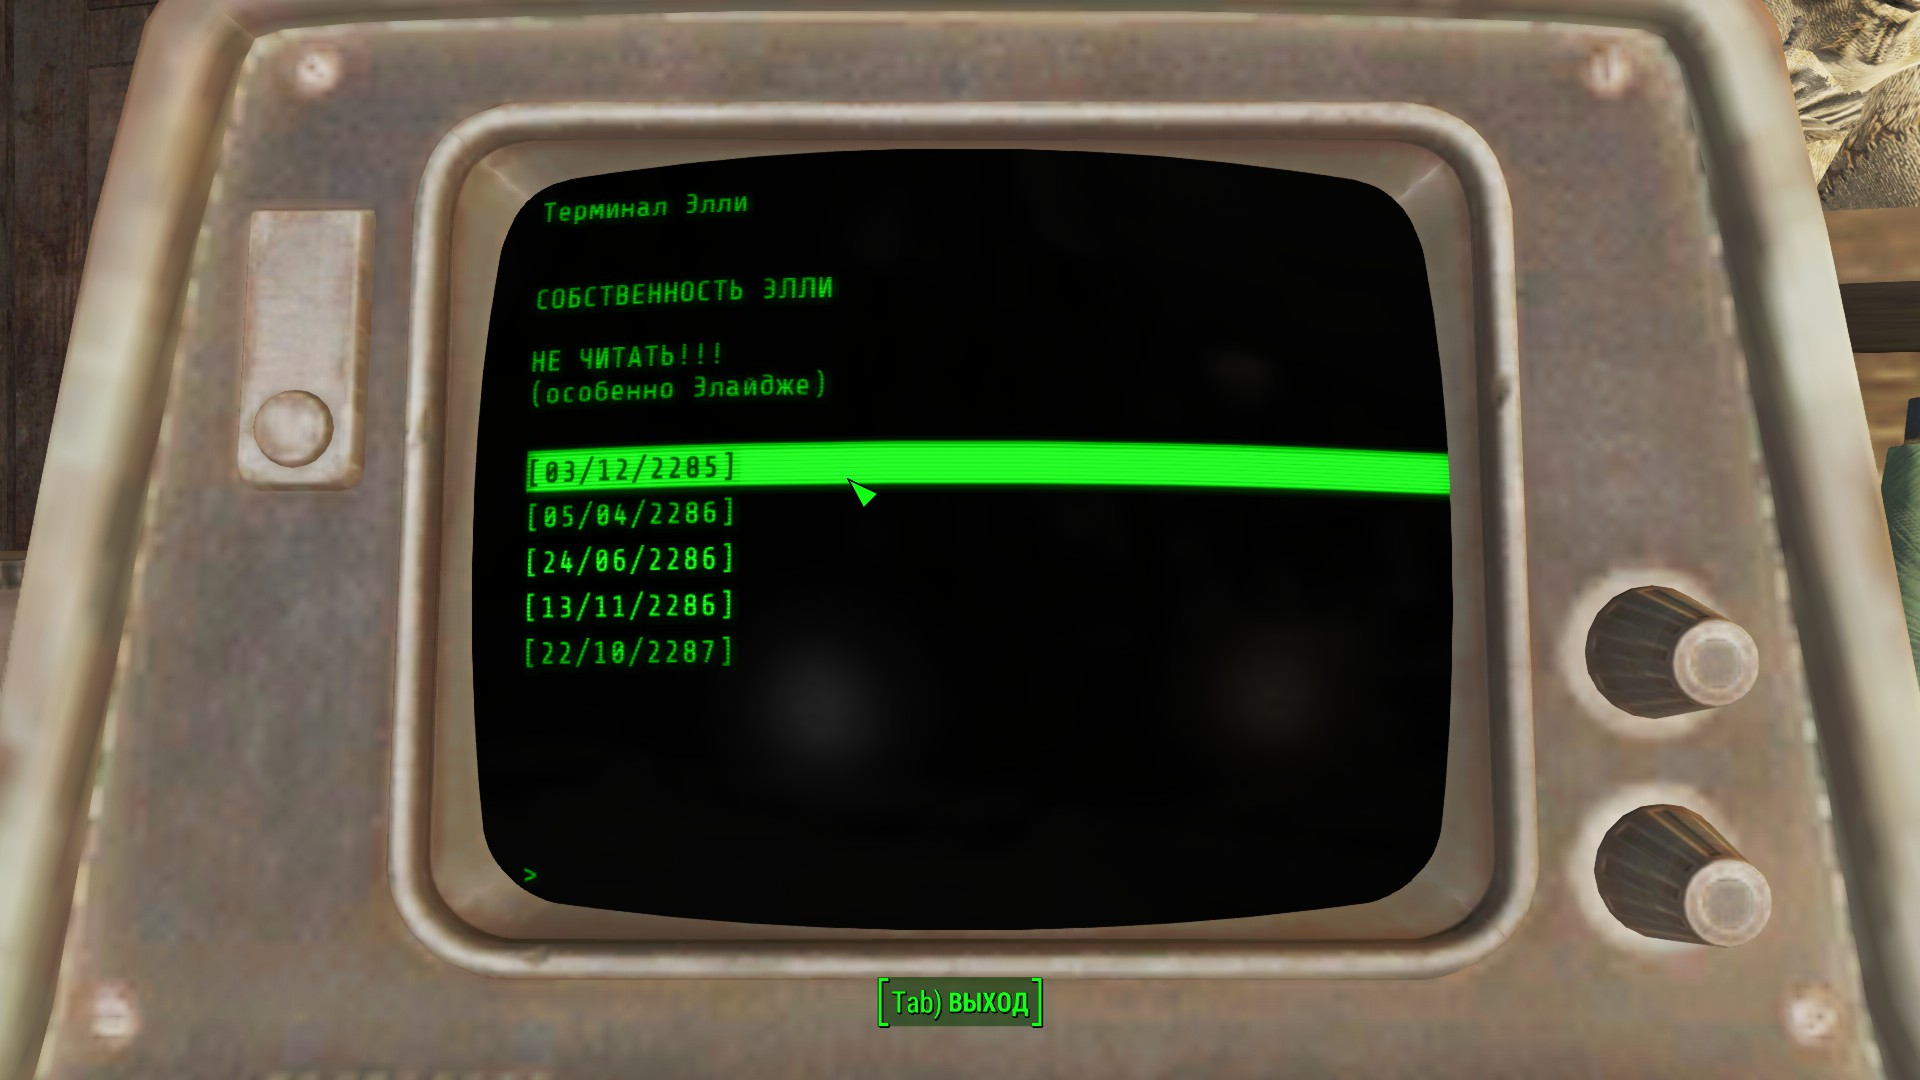 20170930115653_1.jpg - Fallout 4